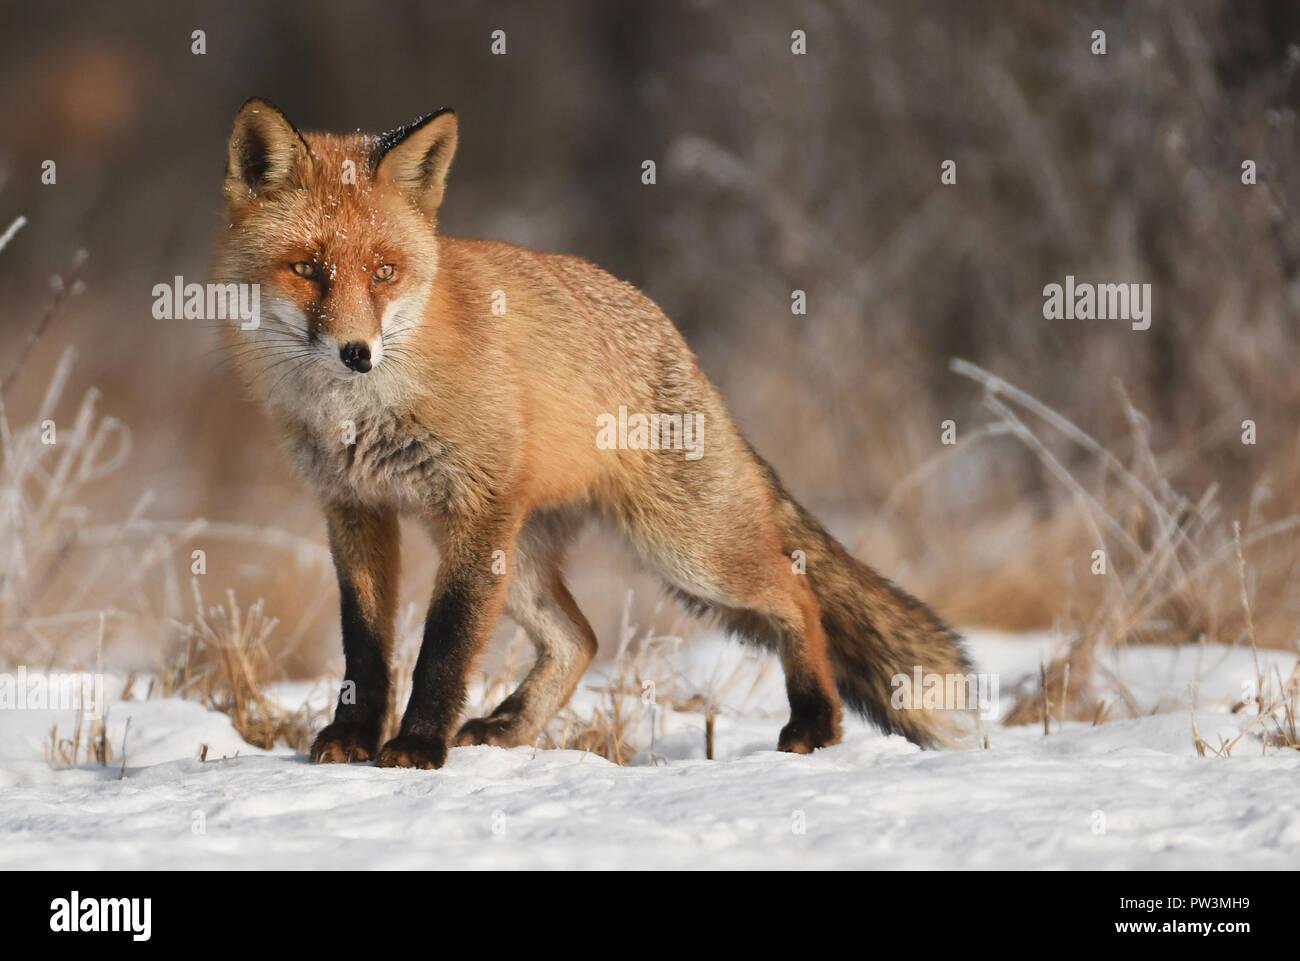 ox in natural habitat - Stock Image